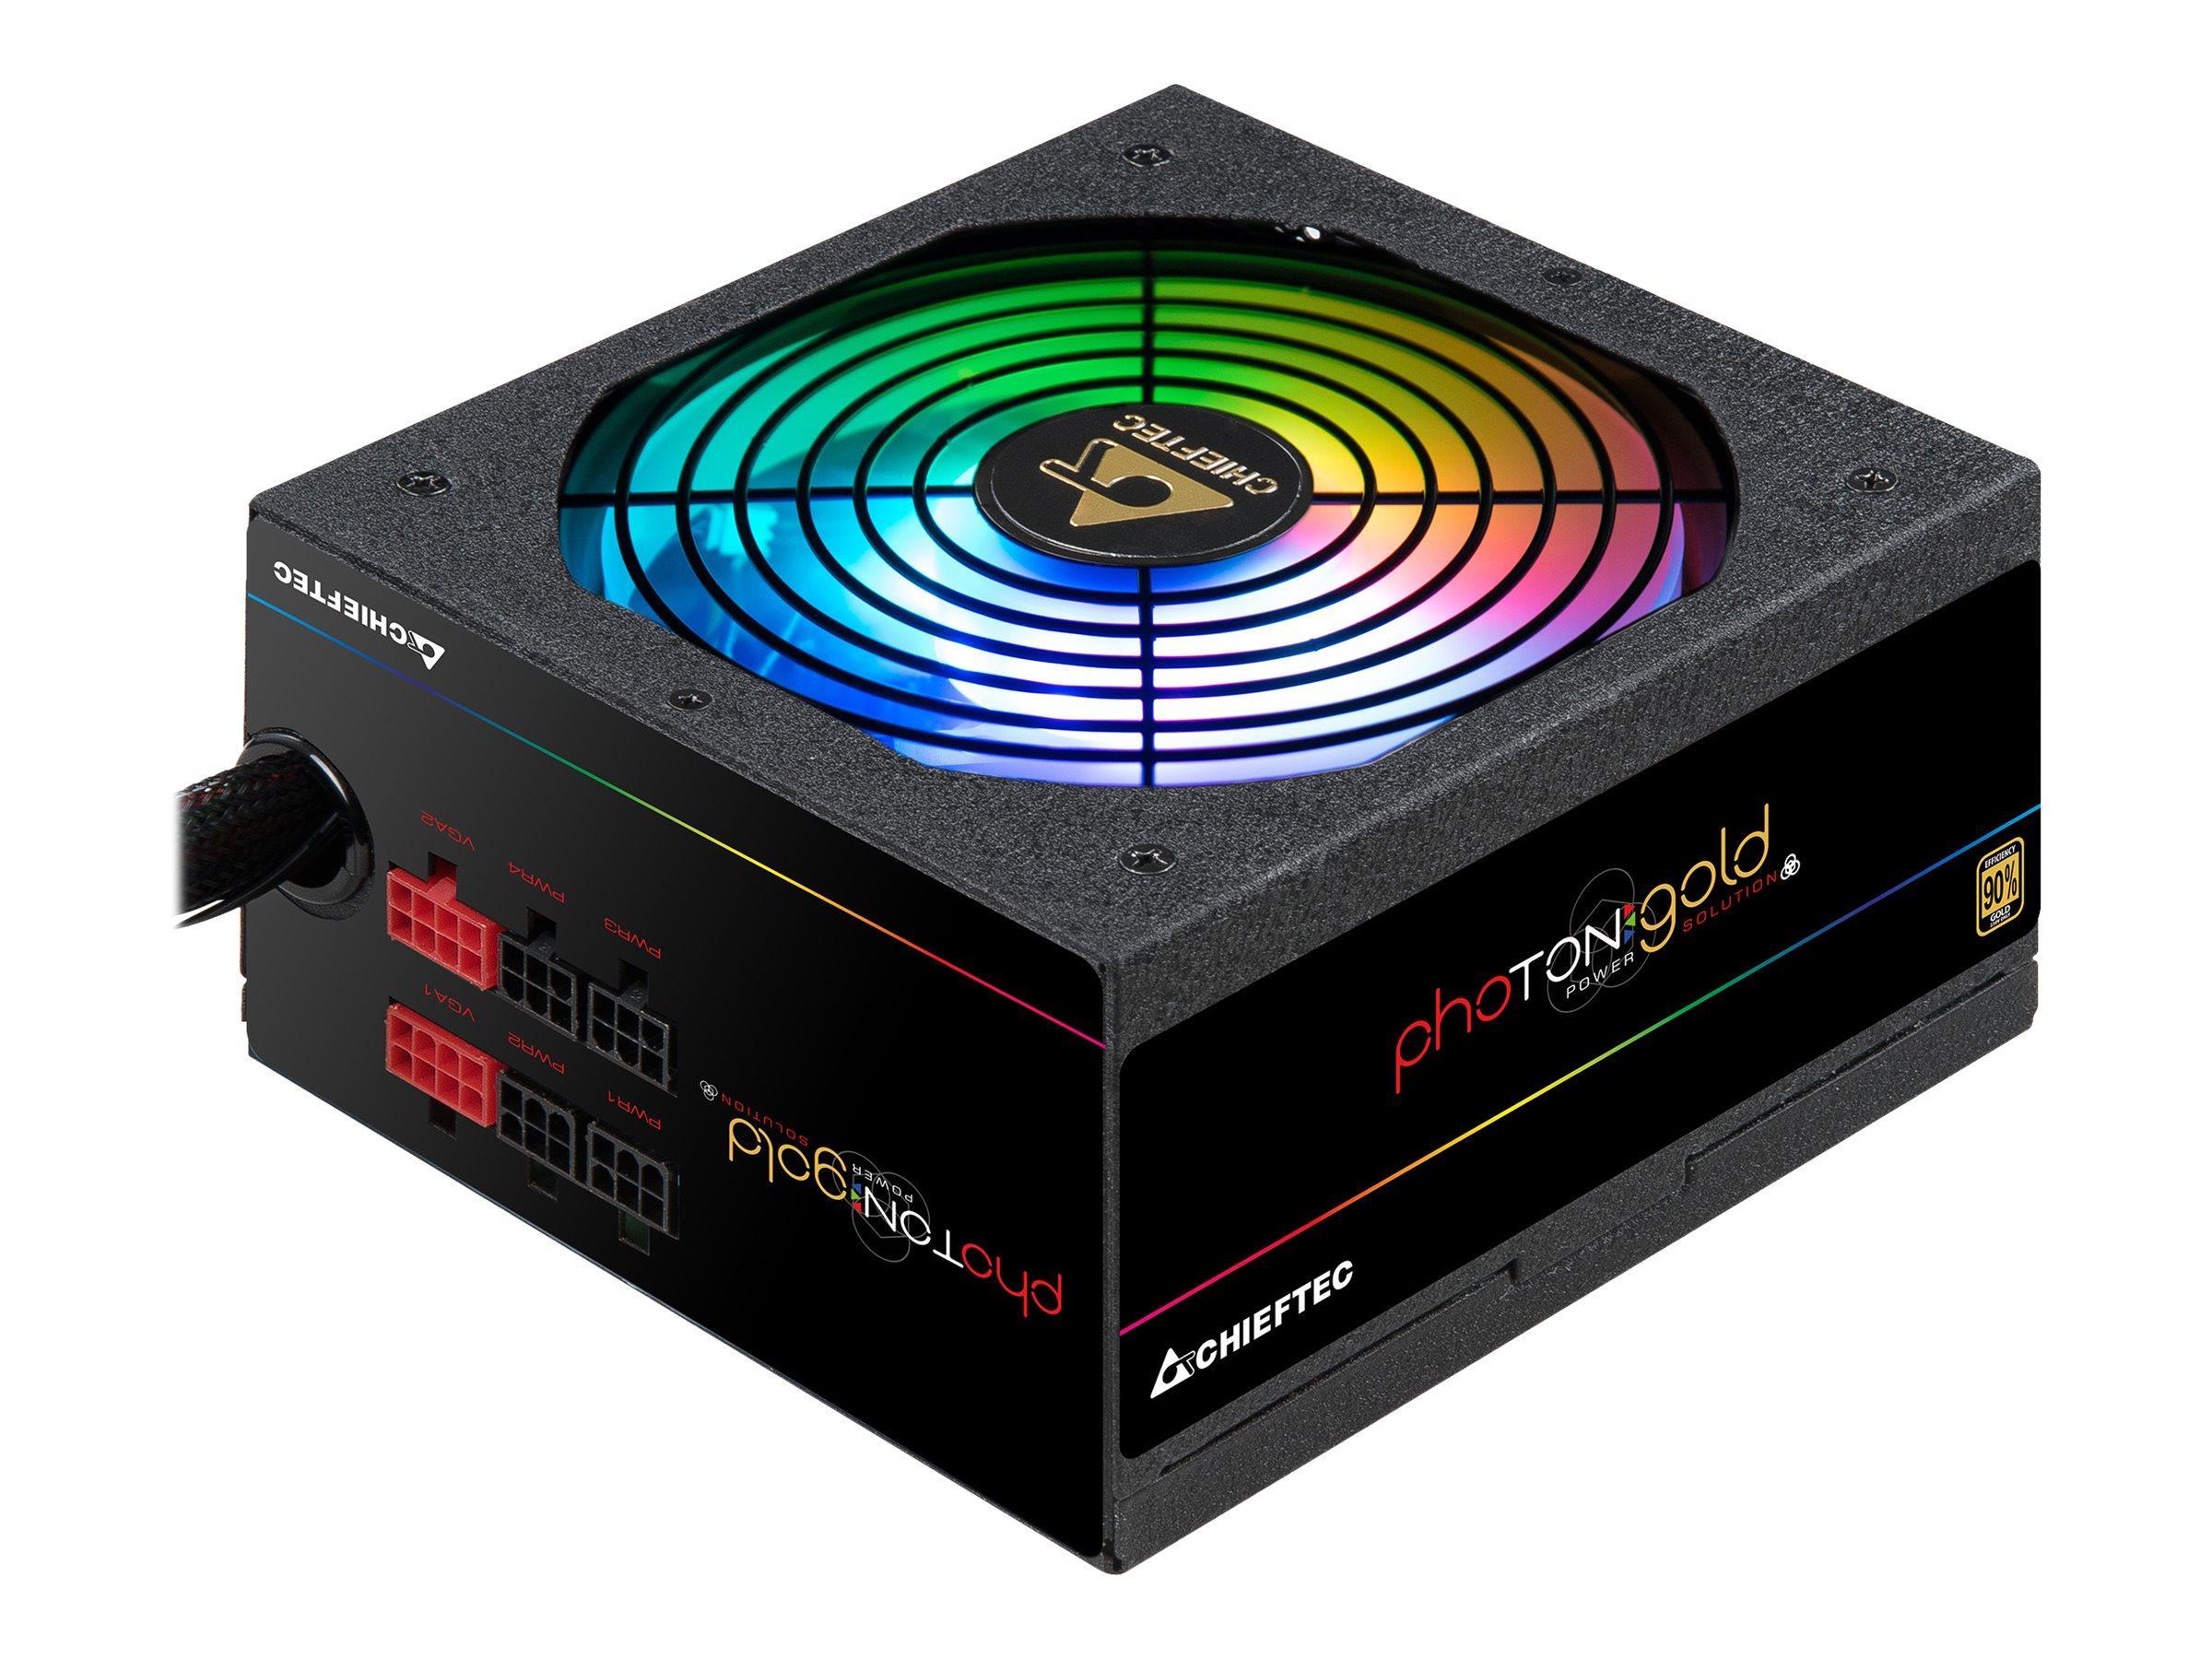 CHIEFTEC Photon RGB 650W ATX 12V 90 proc